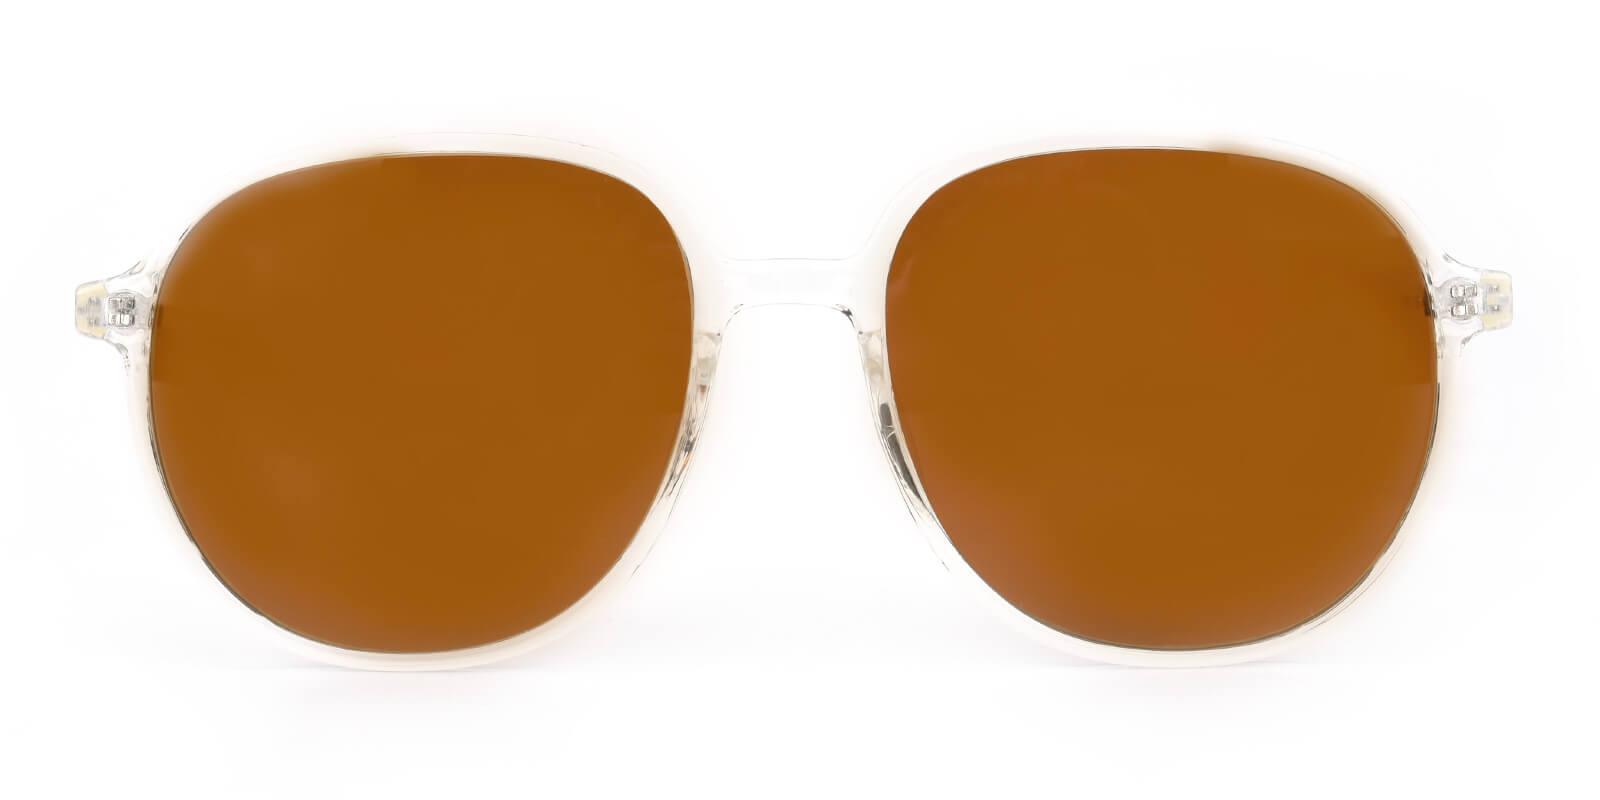 Alinena-Translucent-Round-TR-Sunglasses-additional2